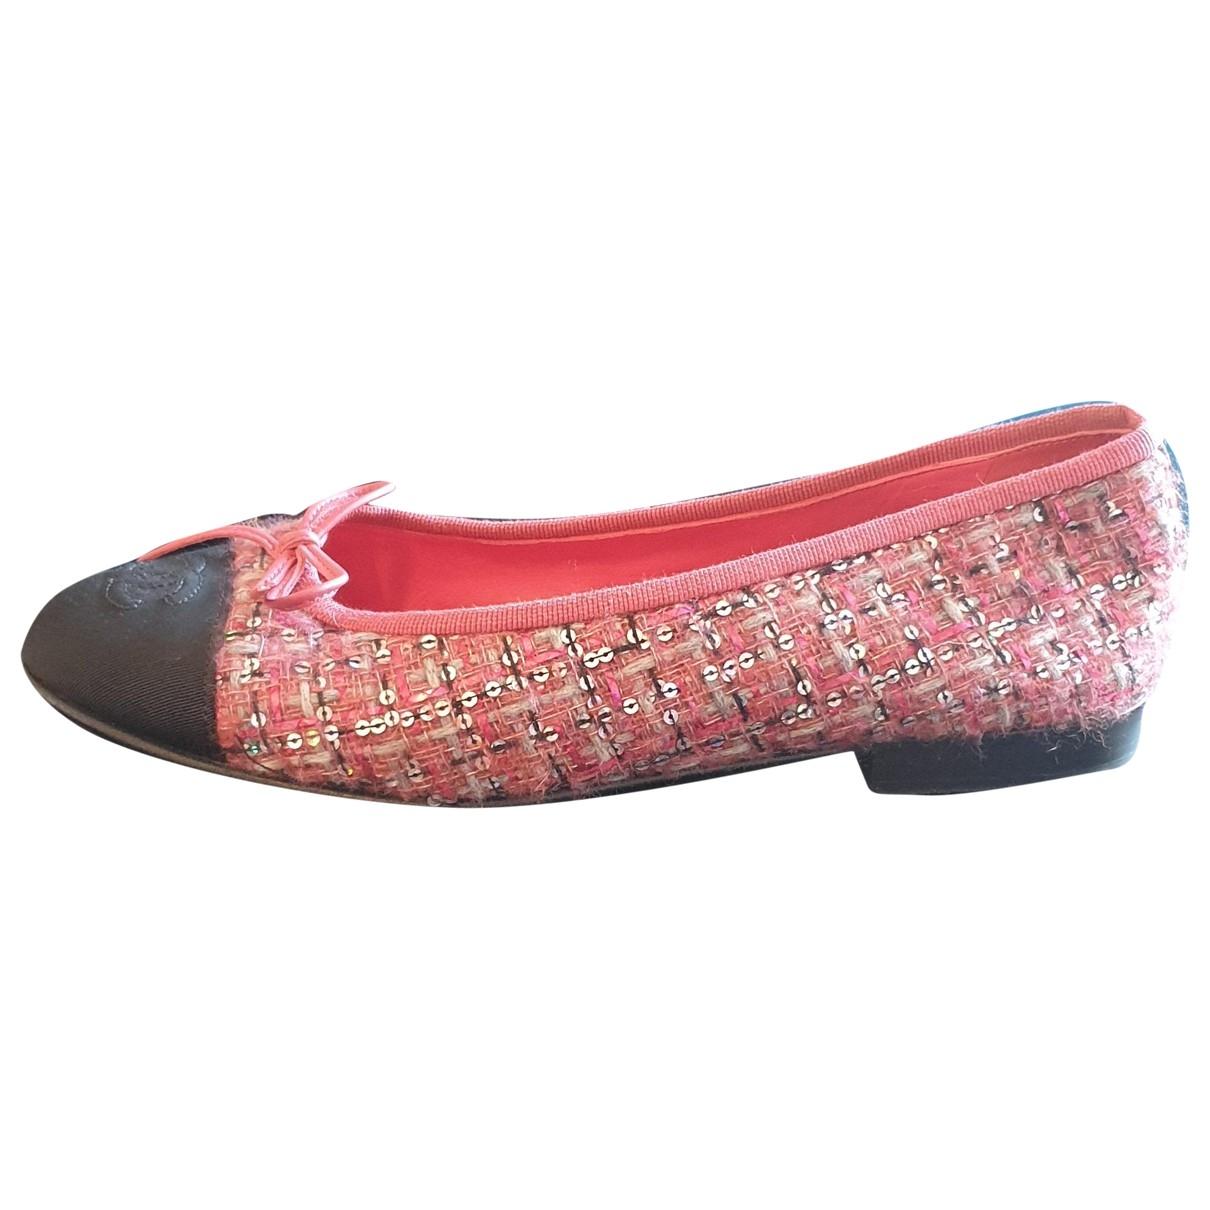 Chanel - Ballerines   pour femme en tweed - rose